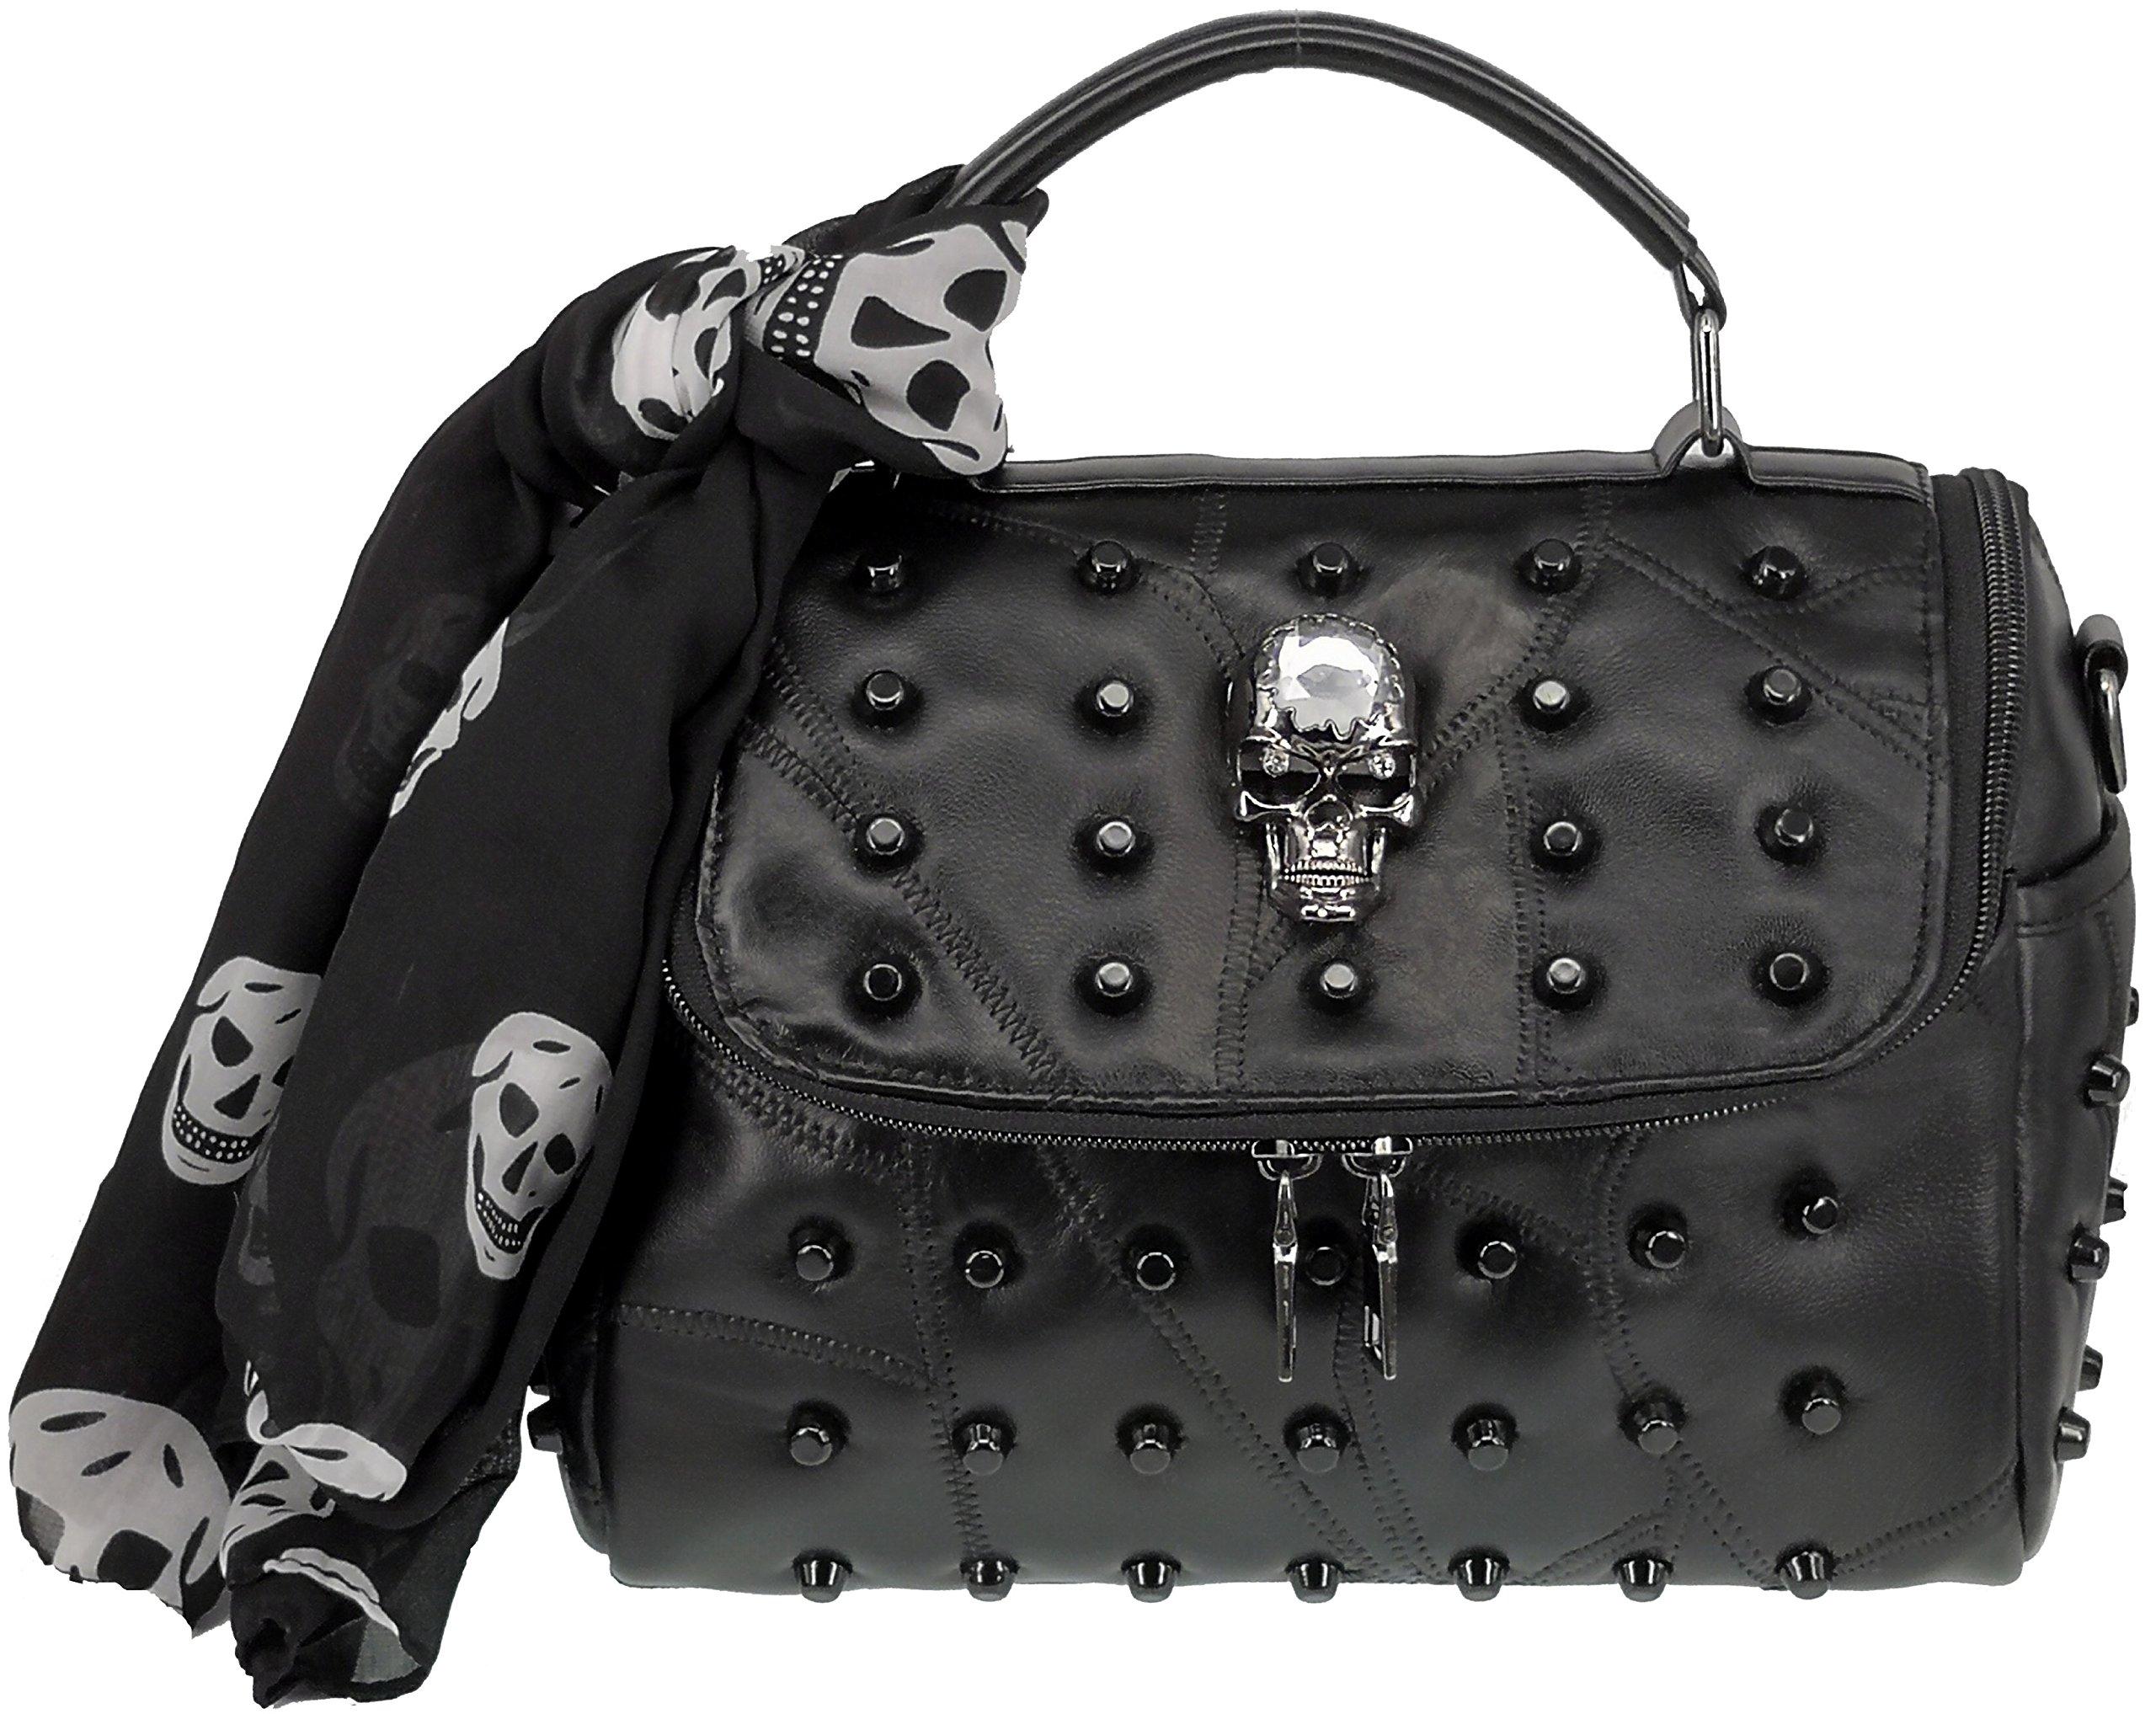 ABC STORY Women Punk Gothic Sheepskin Leather Retro Skull Shoulder Tote Handbag Purse with Scarf Black